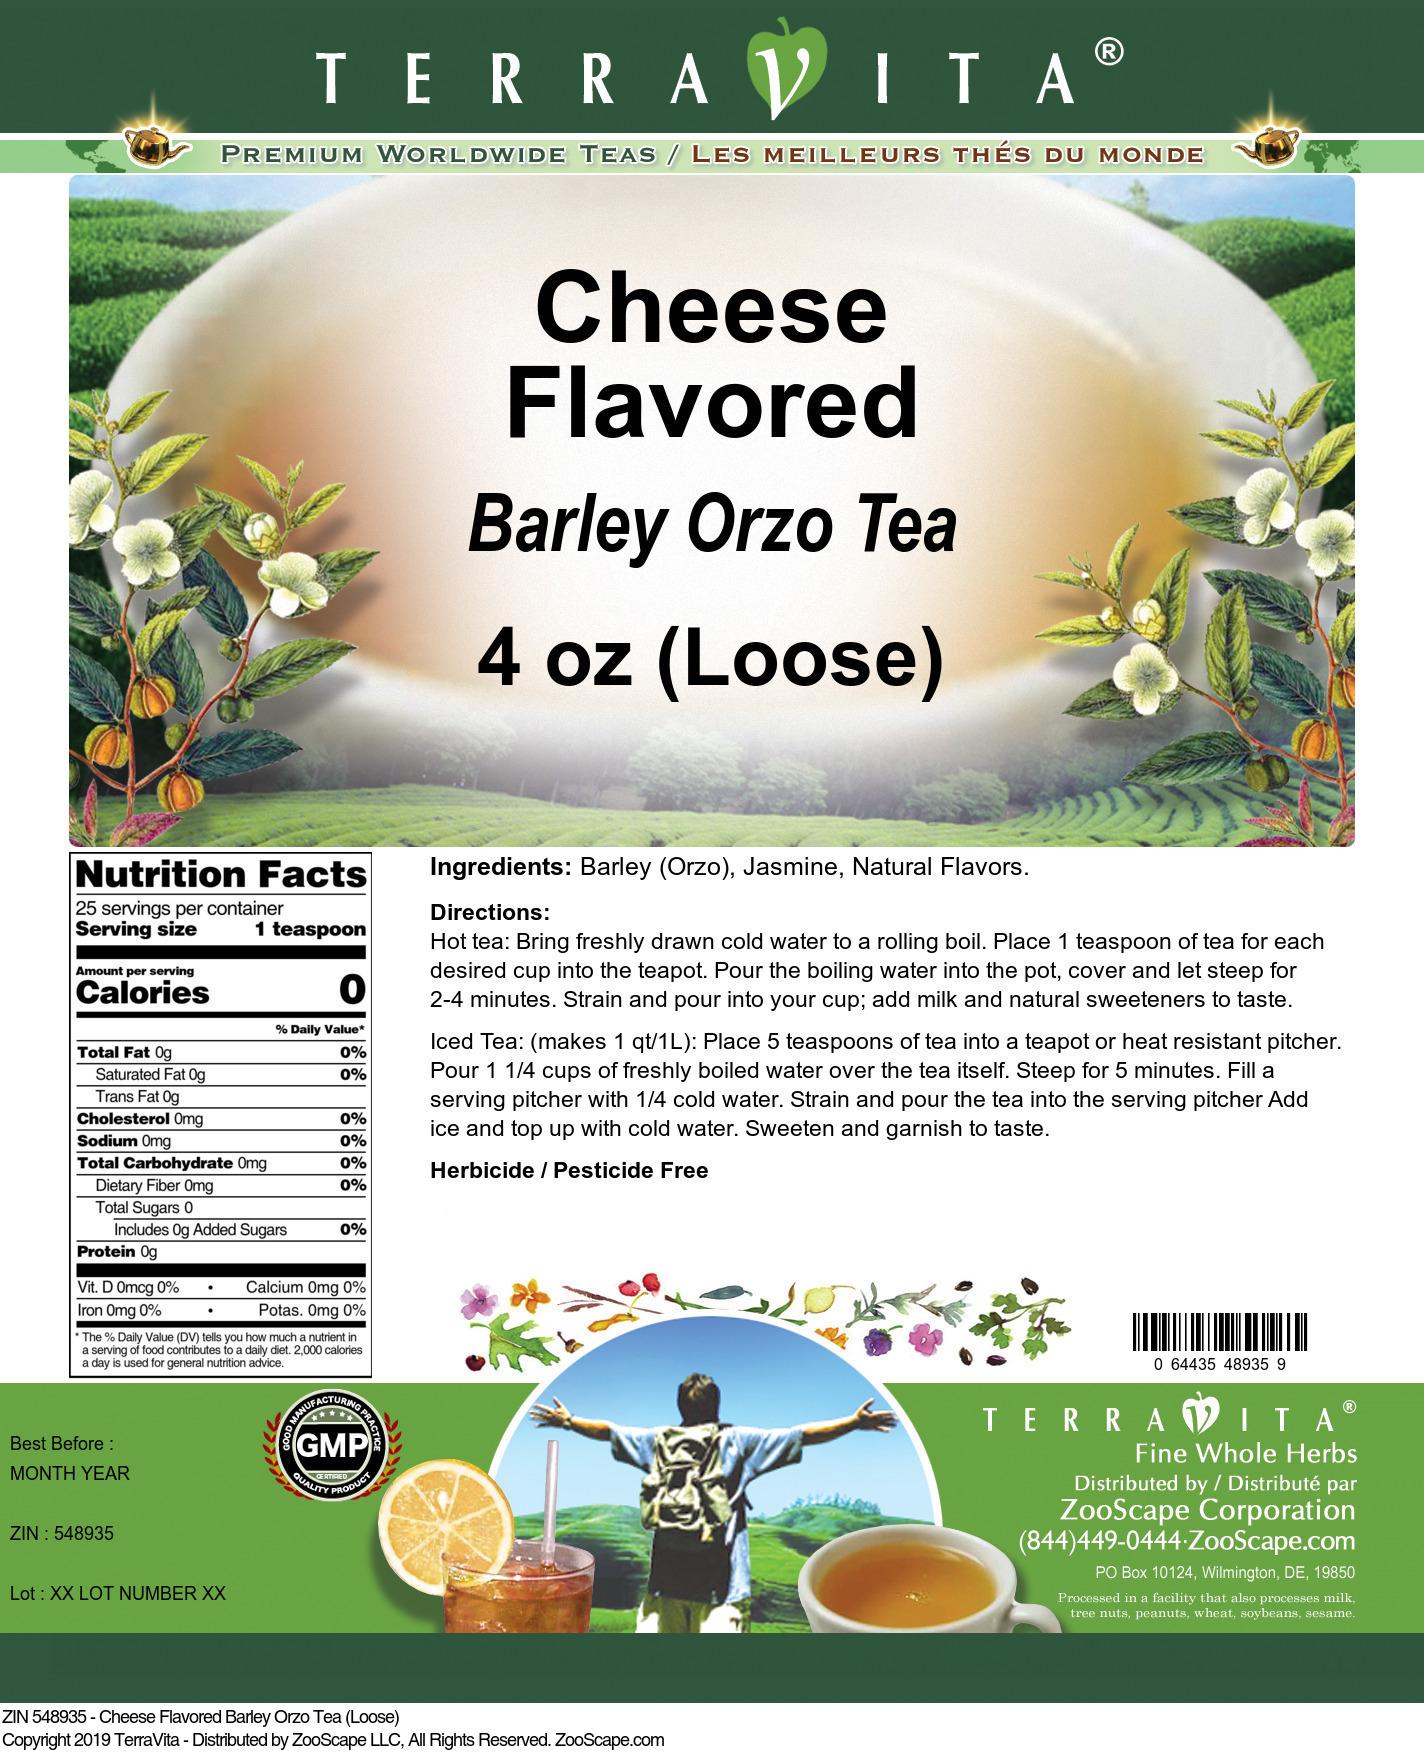 Cheese Flavored Barley Orzo